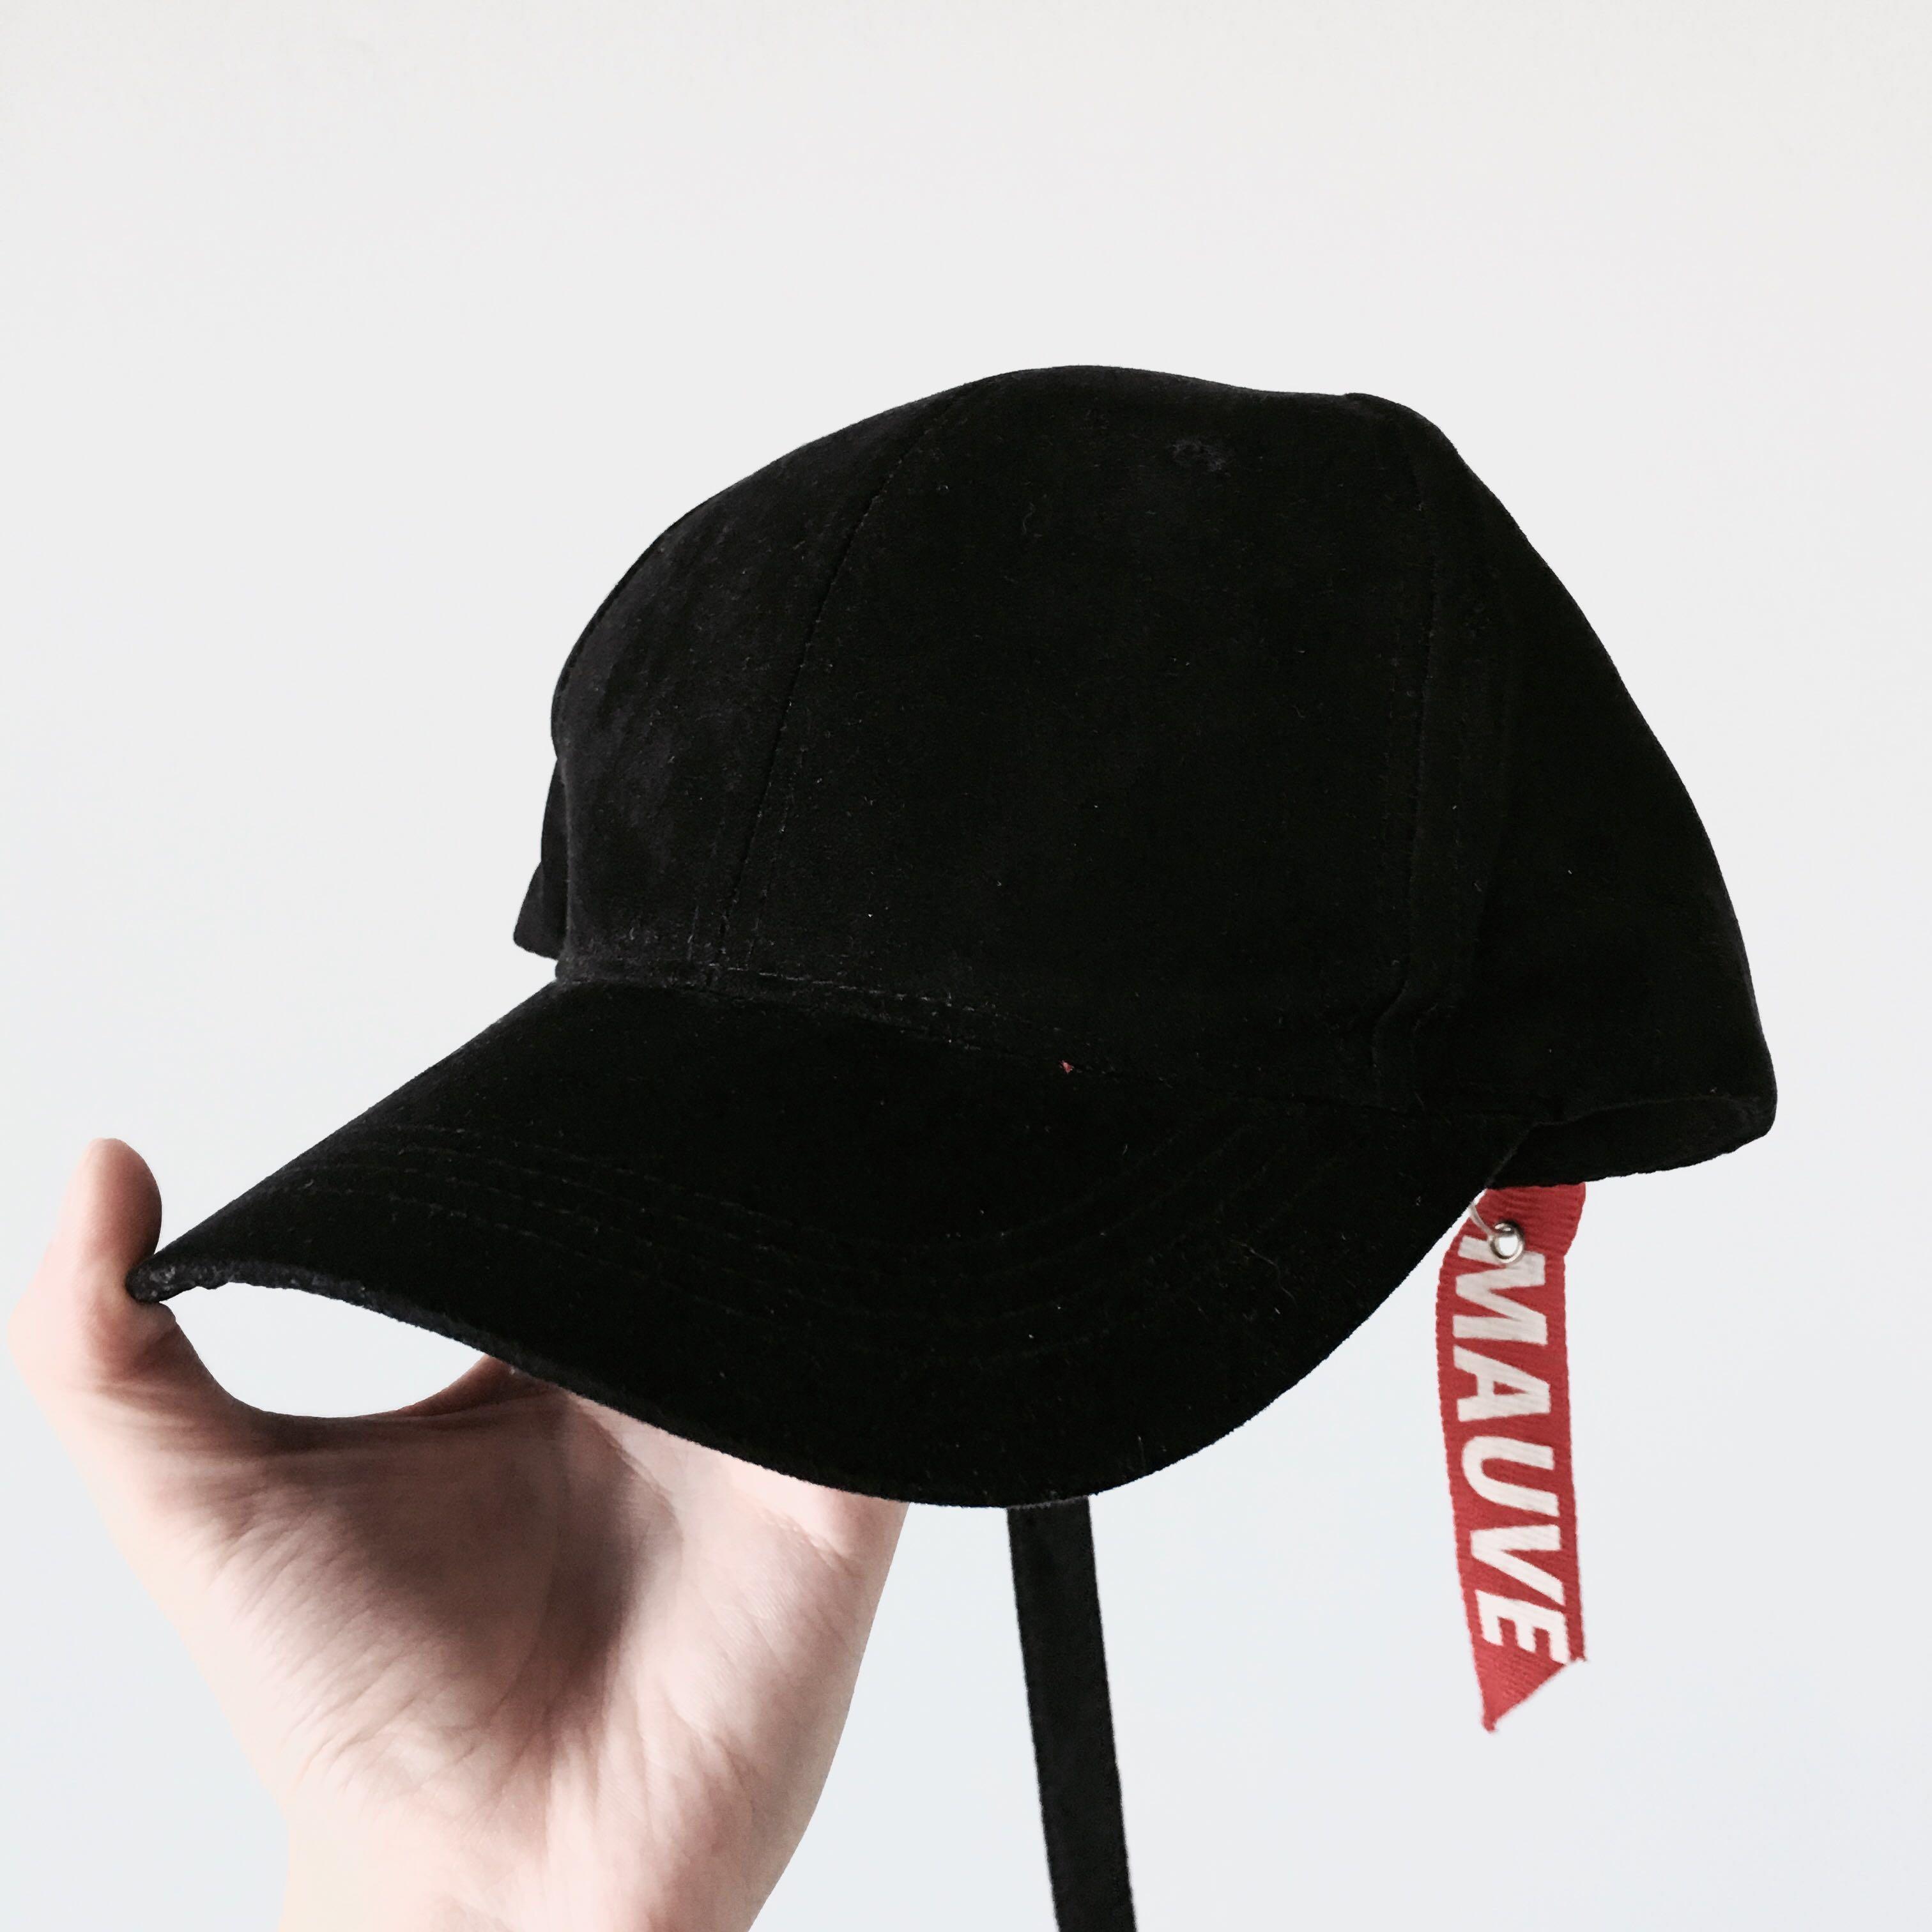 c4a090dbfee Korean Streetwear Mauve Long Strap Black Cap